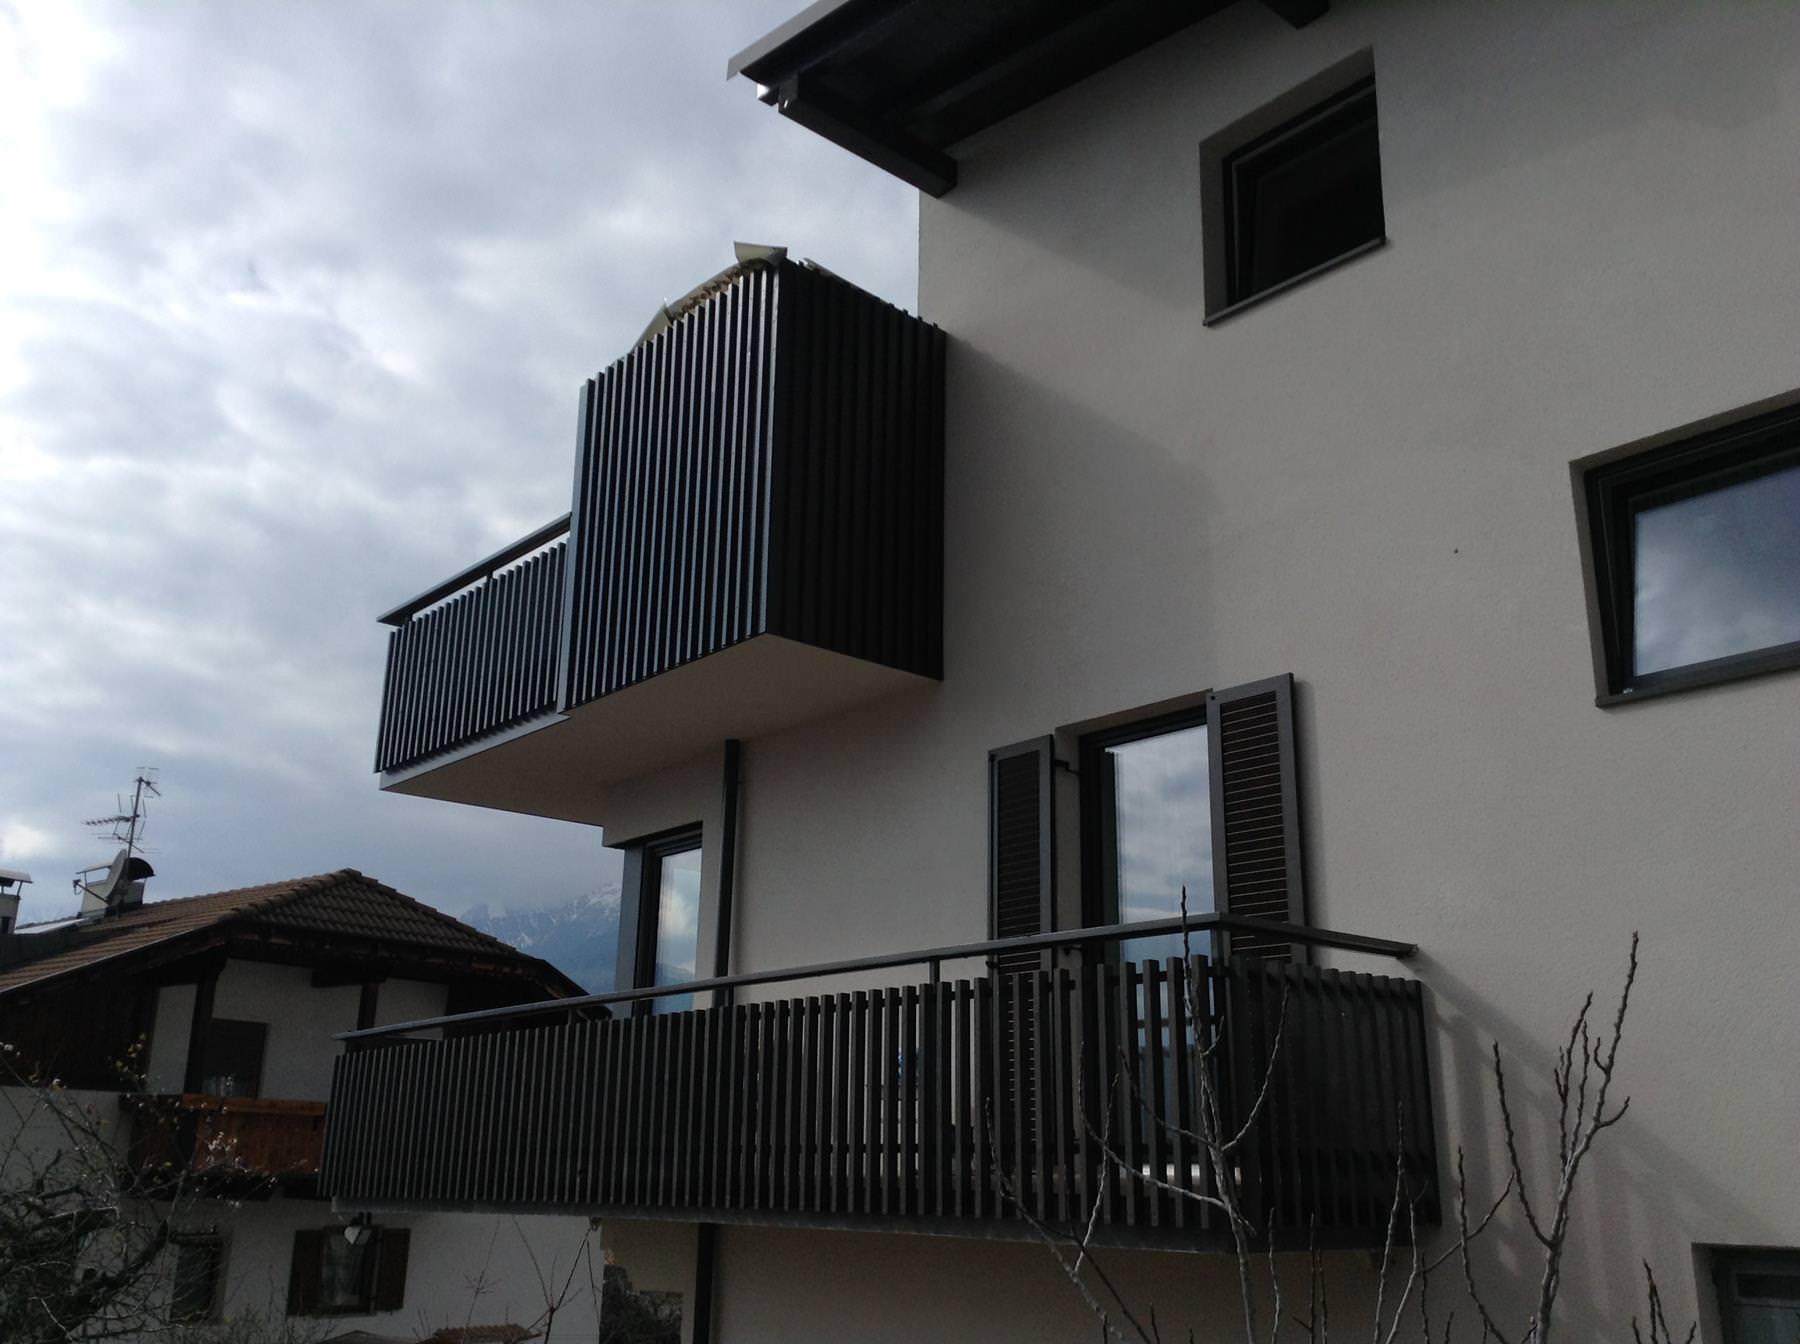 Haus G. – Schenna Haus G. - Schenna - Haus GSchenna 9 - Haus G. – Schenna Projekte - Haus GSchenna 9 - Projekte